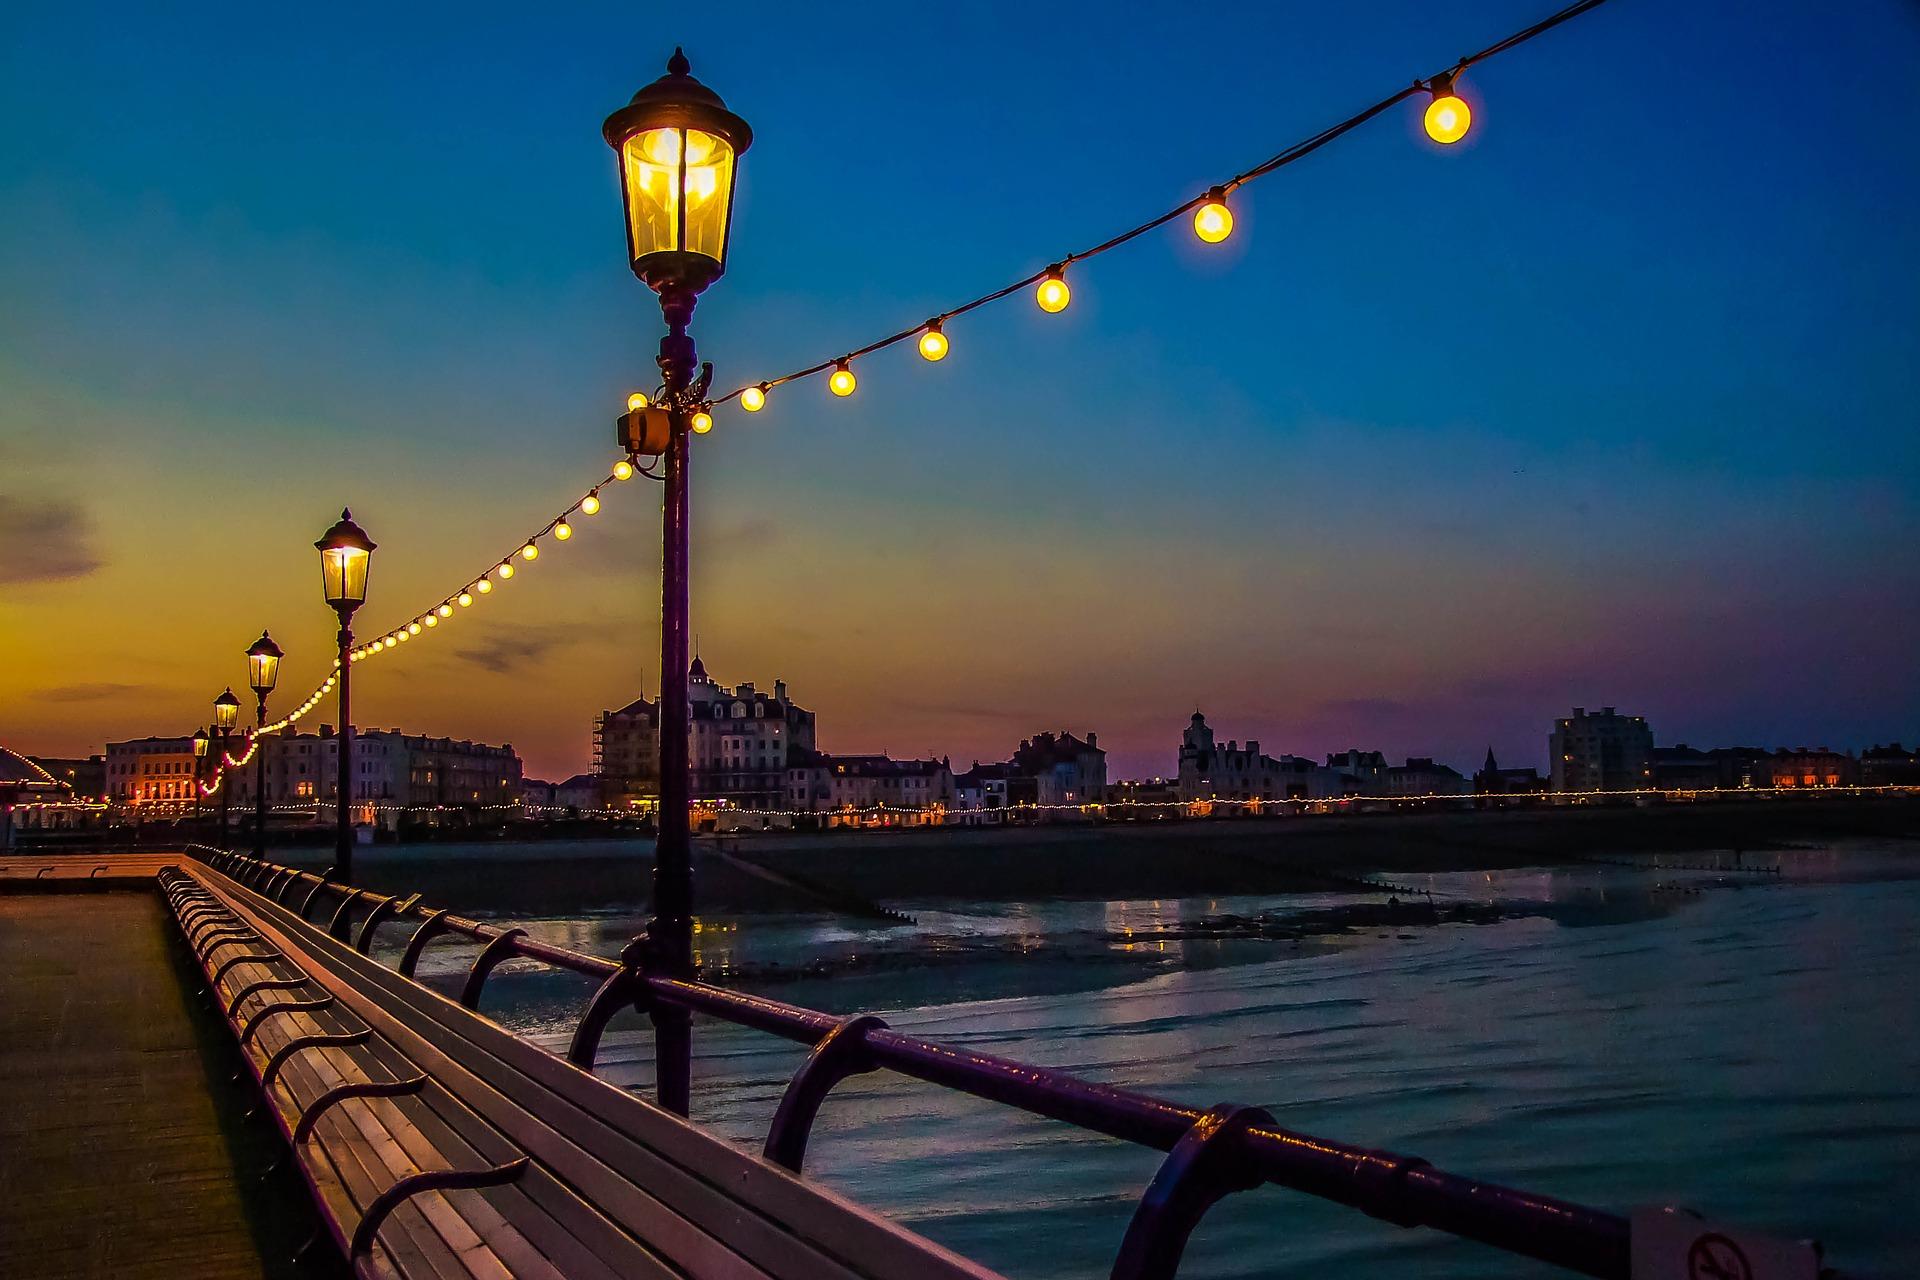 Brighton_CC0.jpg?1543336695